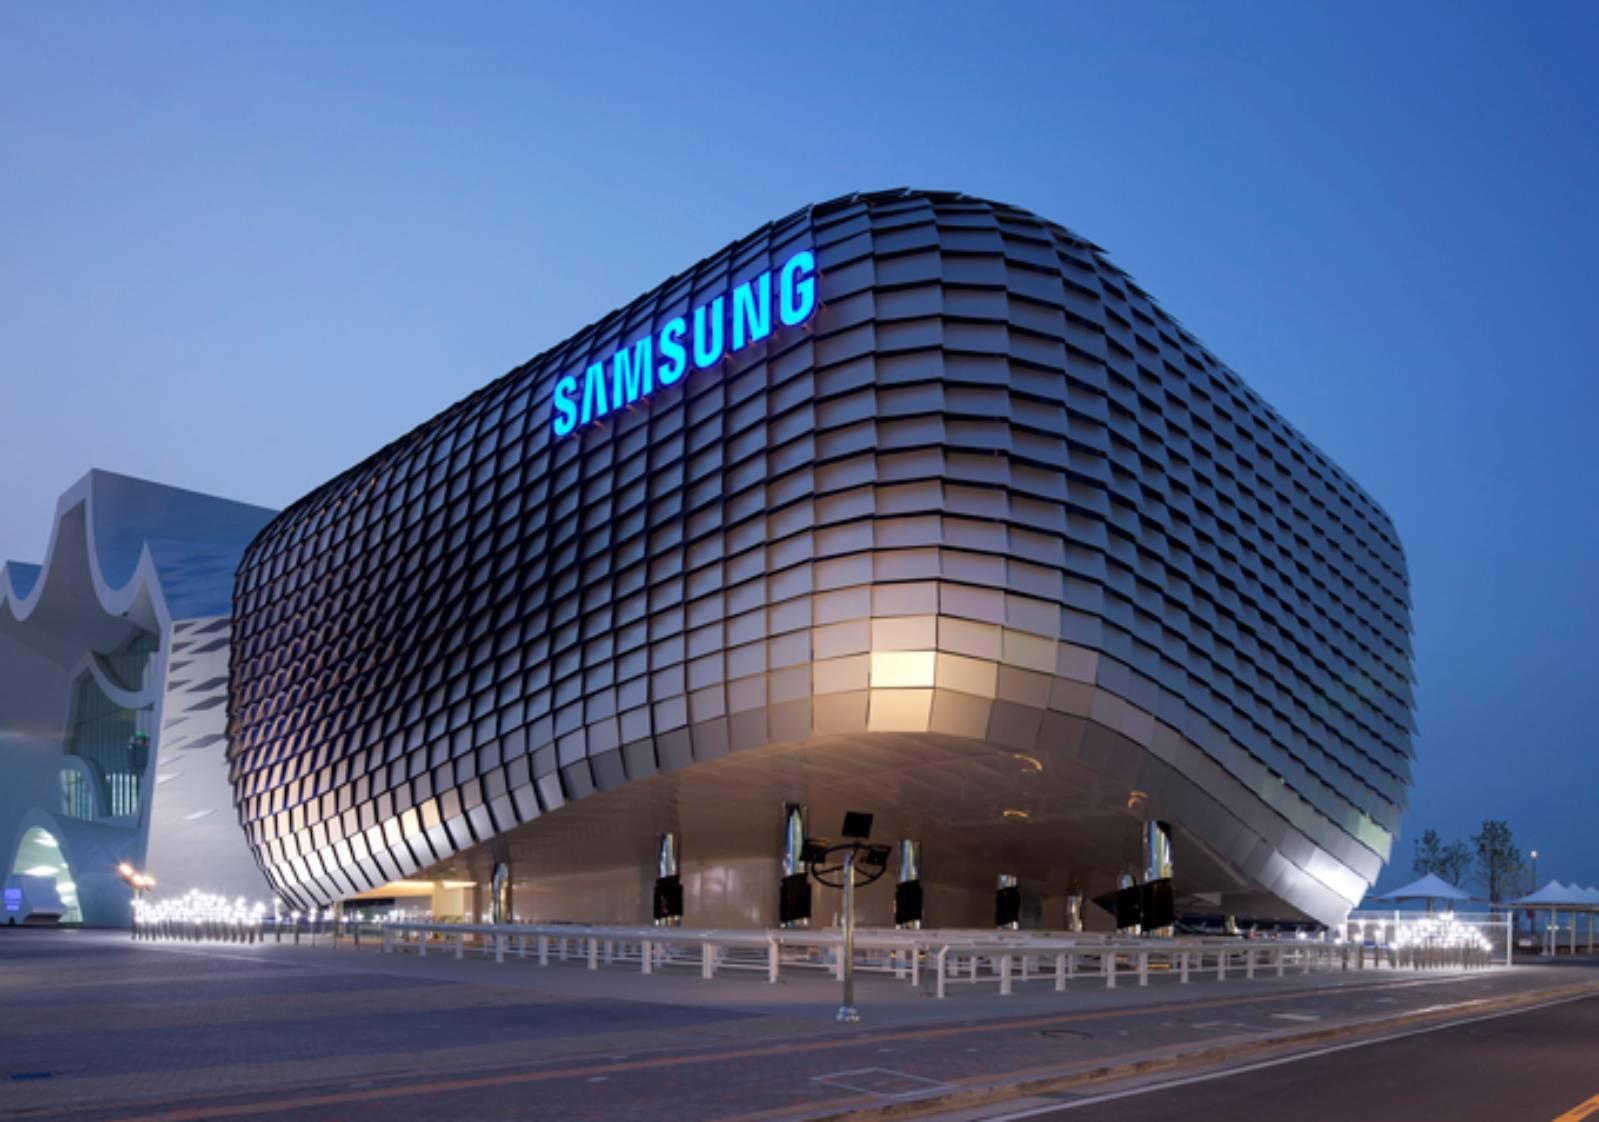 samsung electronics Samsung electronics co ltd stock - 005930kr news, historical stock charts, analyst ratings, financials, and today's samsung electronics co ltd stock price.